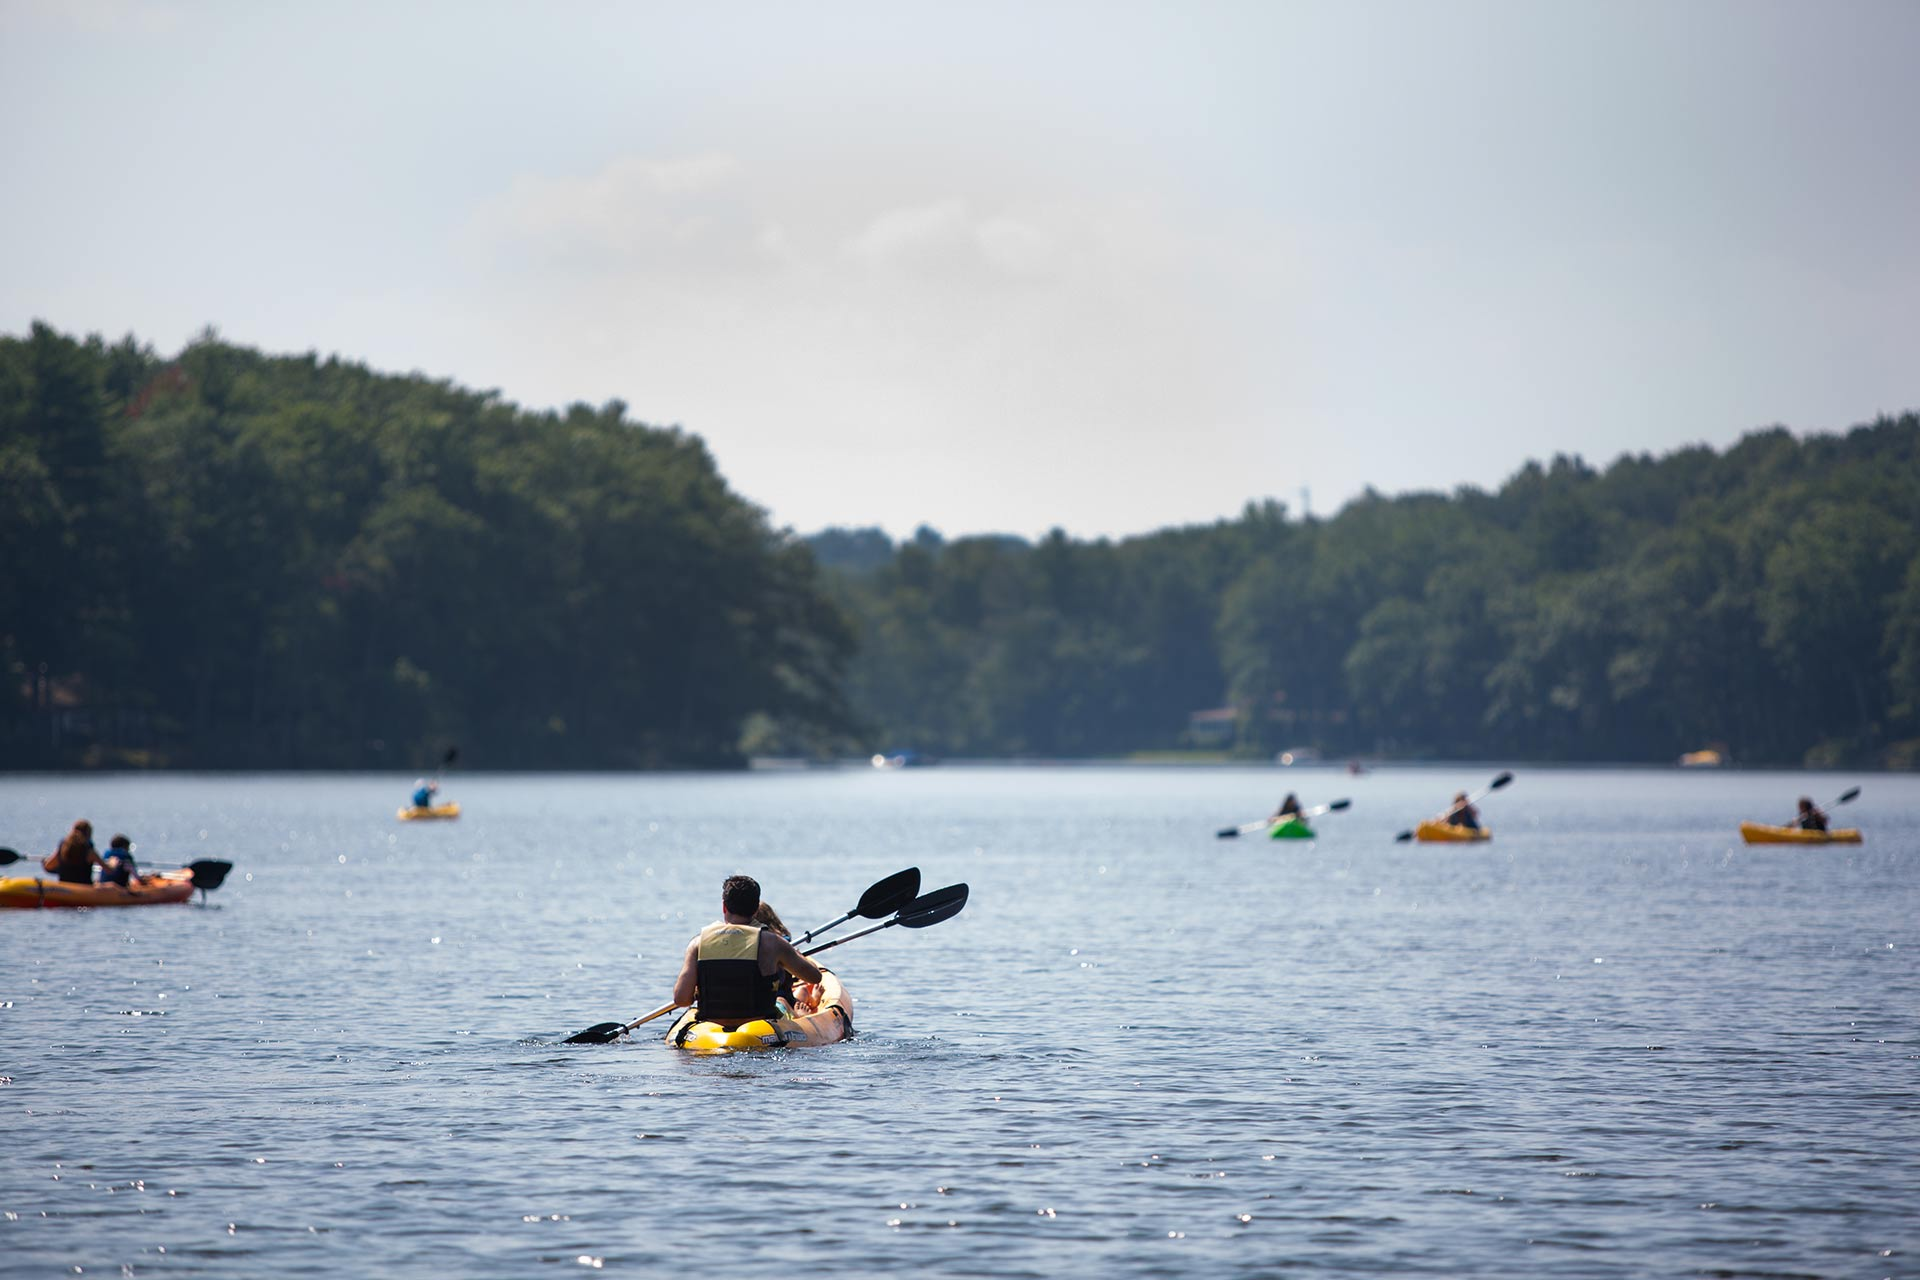 Kayaking at Woodloch Pines in the Poconos, Pennsylvania.